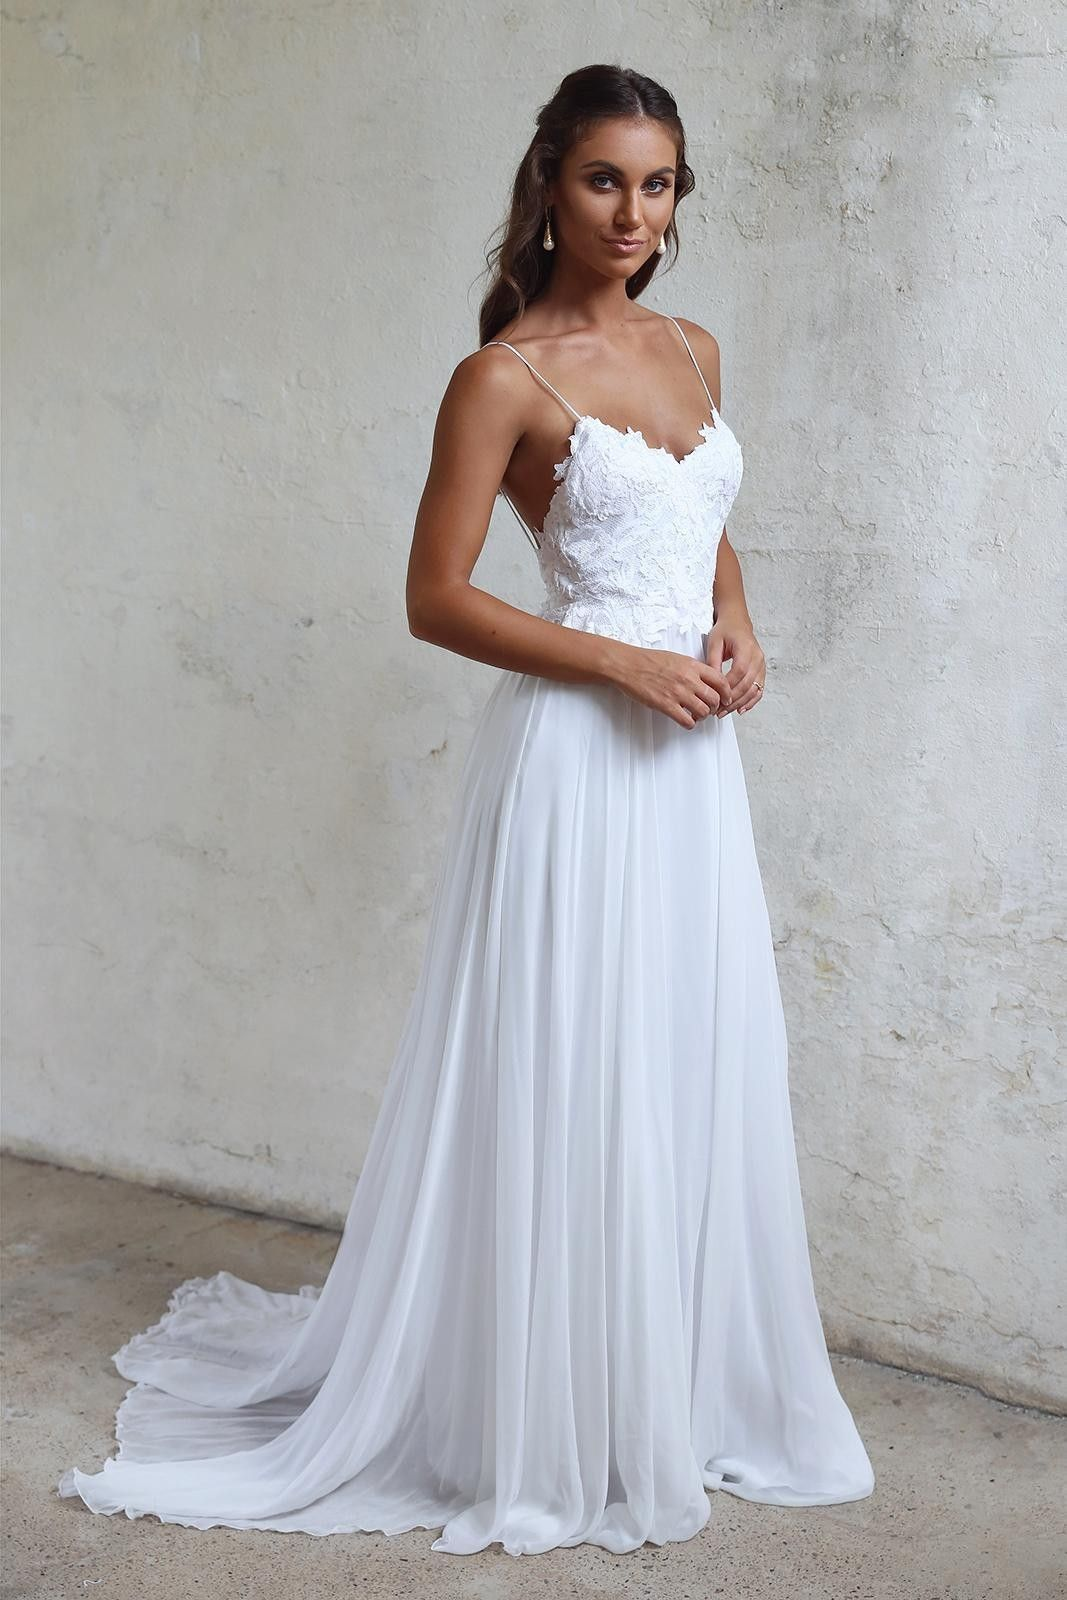 Pin By Pamilo Castrapani On Ladies Fashions Wedding Dresses